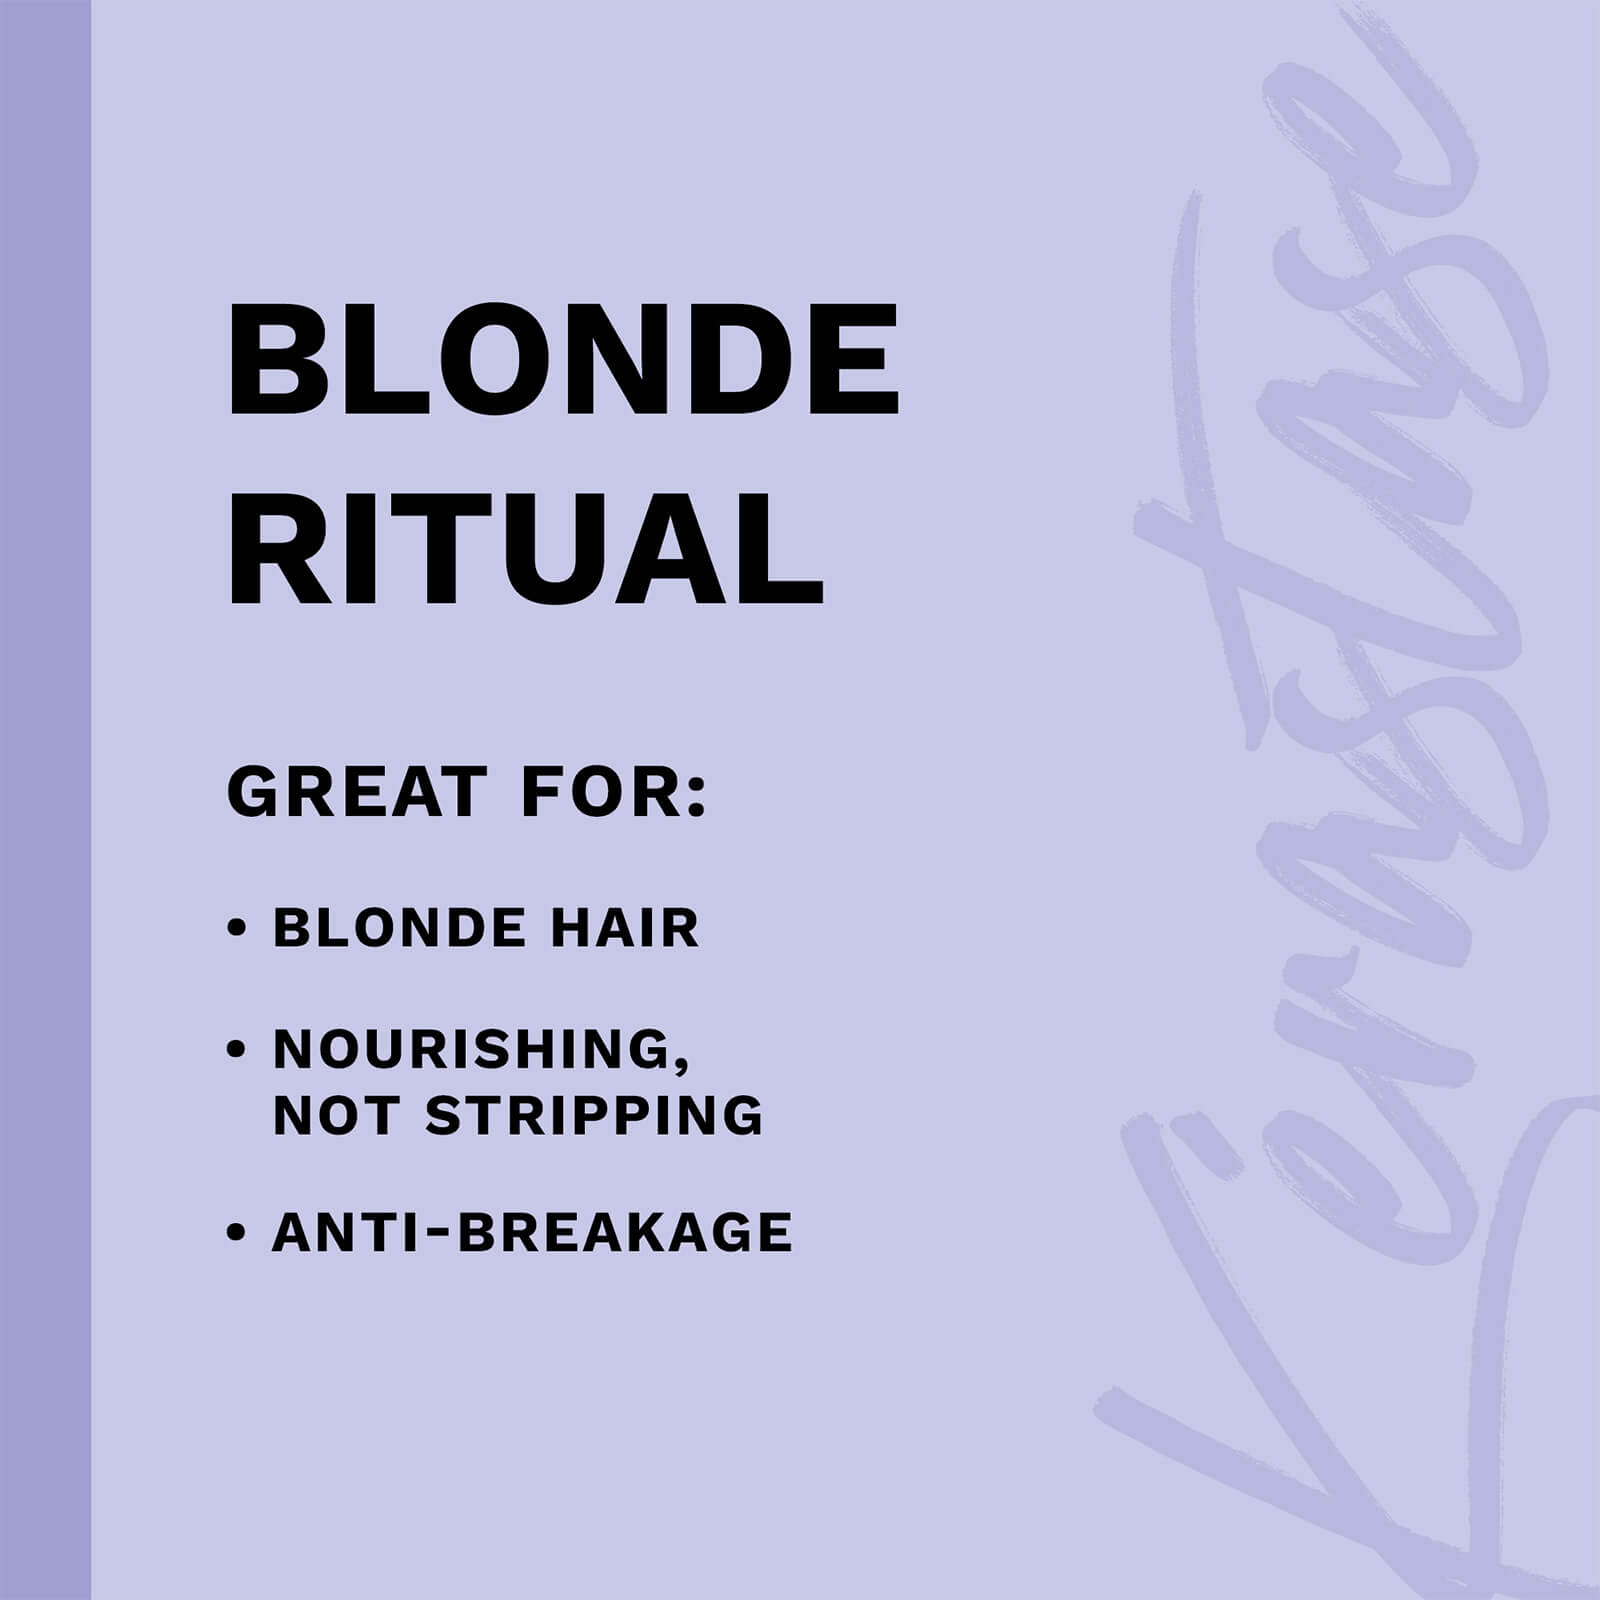 Kérastase Limited Edition 2021 - Master (Beauty Box) - Kérastase Blonde Limited Edition Box